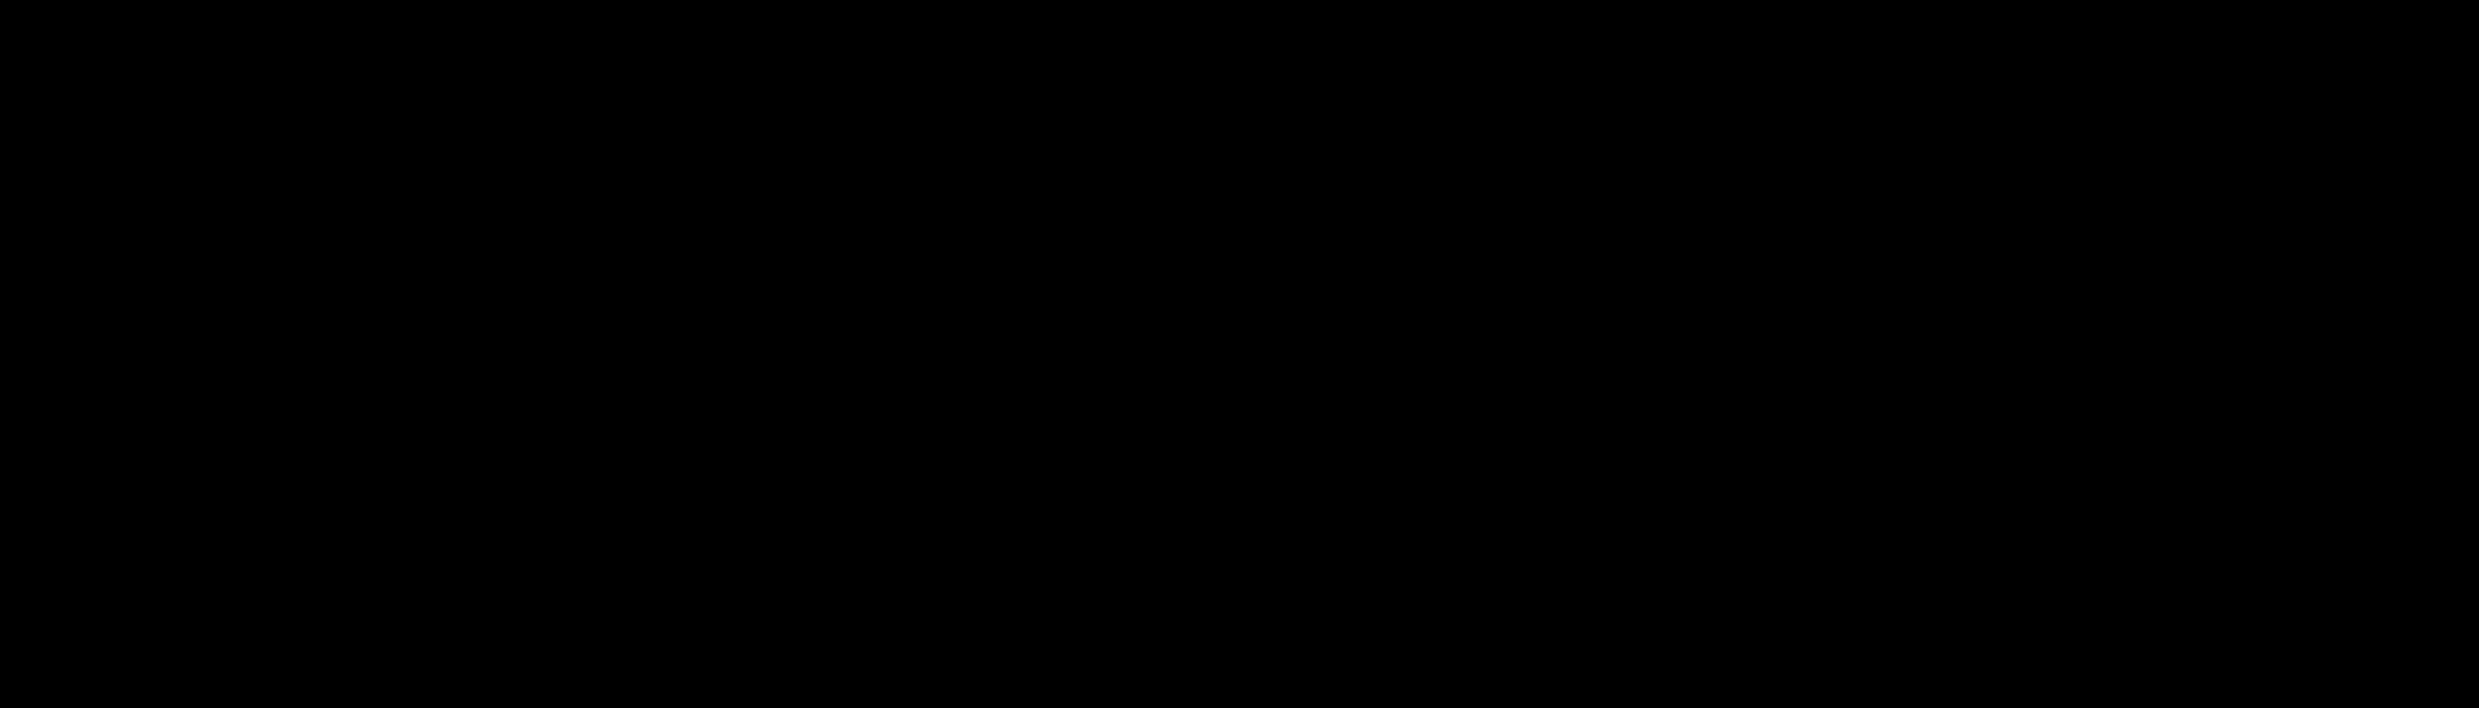 Info-Kontakt 13